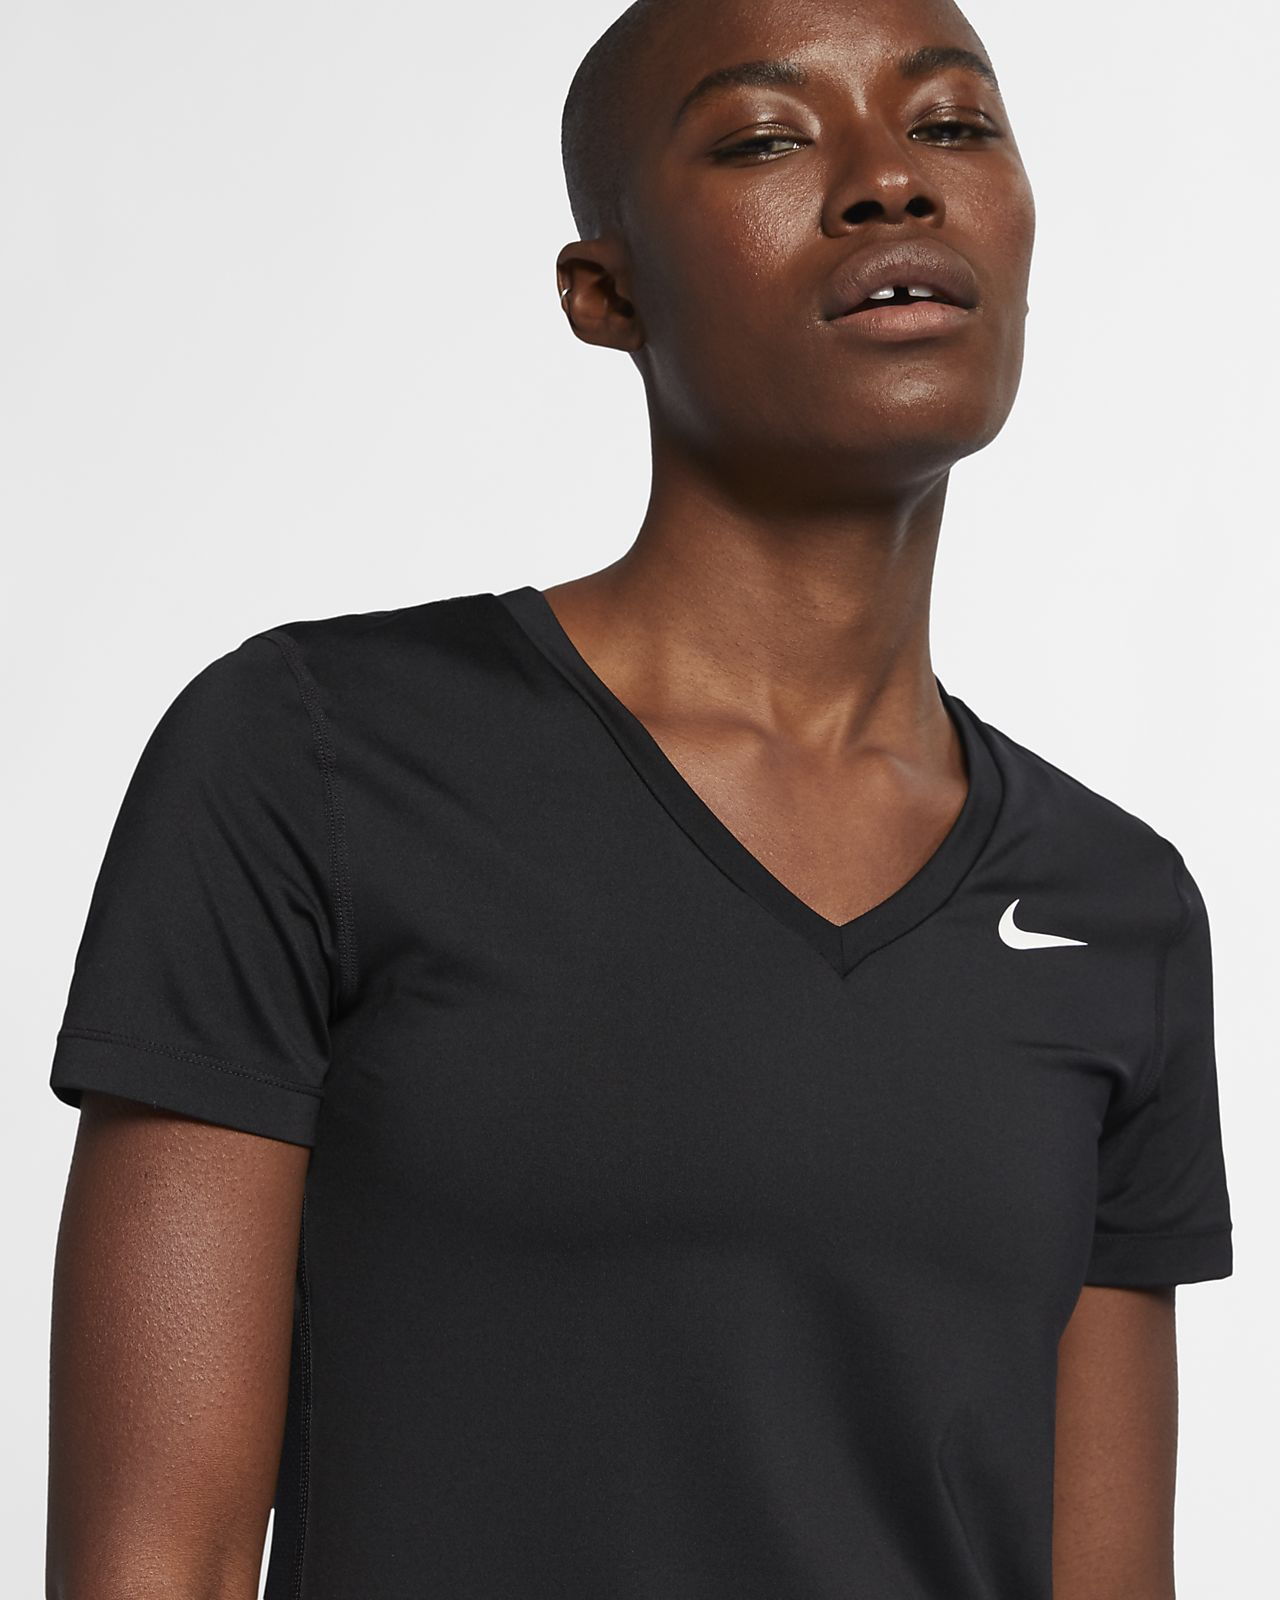 Nike Dri FIT Victory Camiseta de entrenamiento de manga corta Mujer